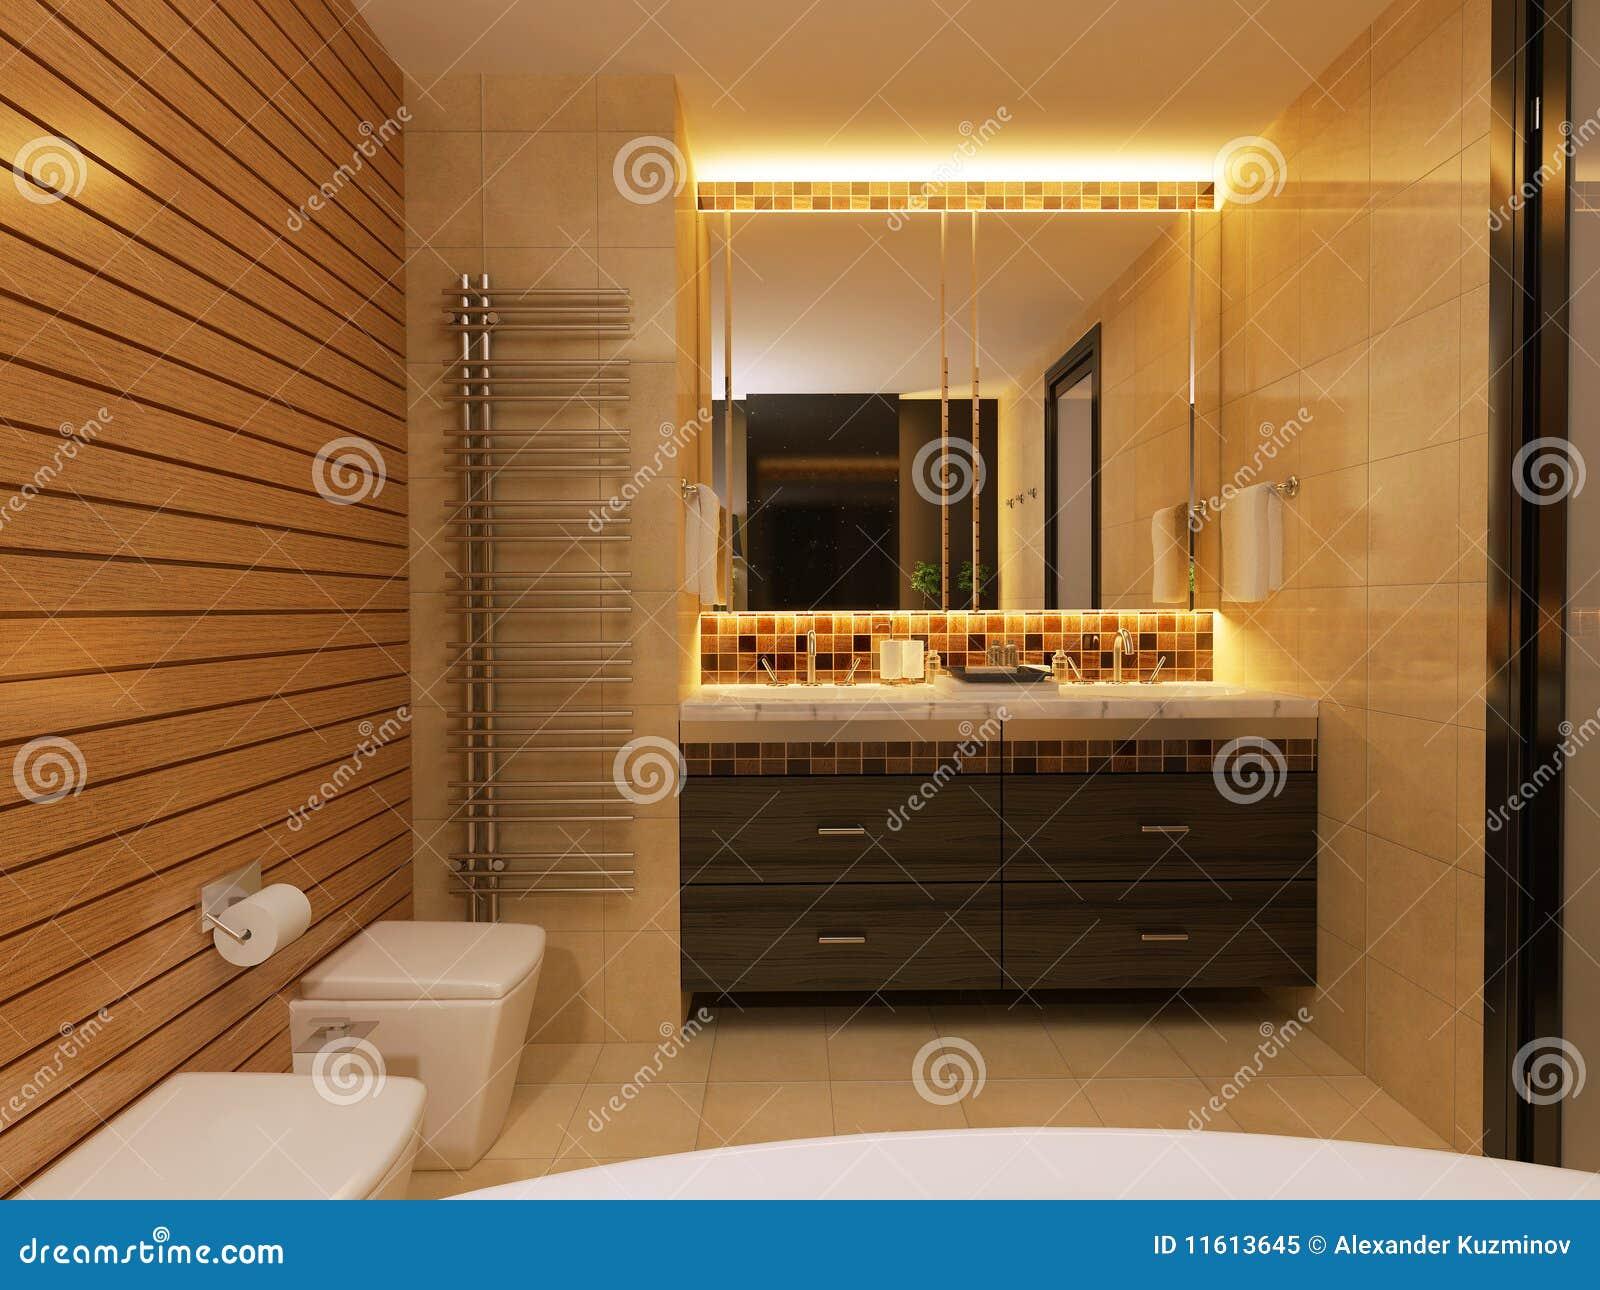 BathroomMirrorDressing Table Royalty Free Stock Photo